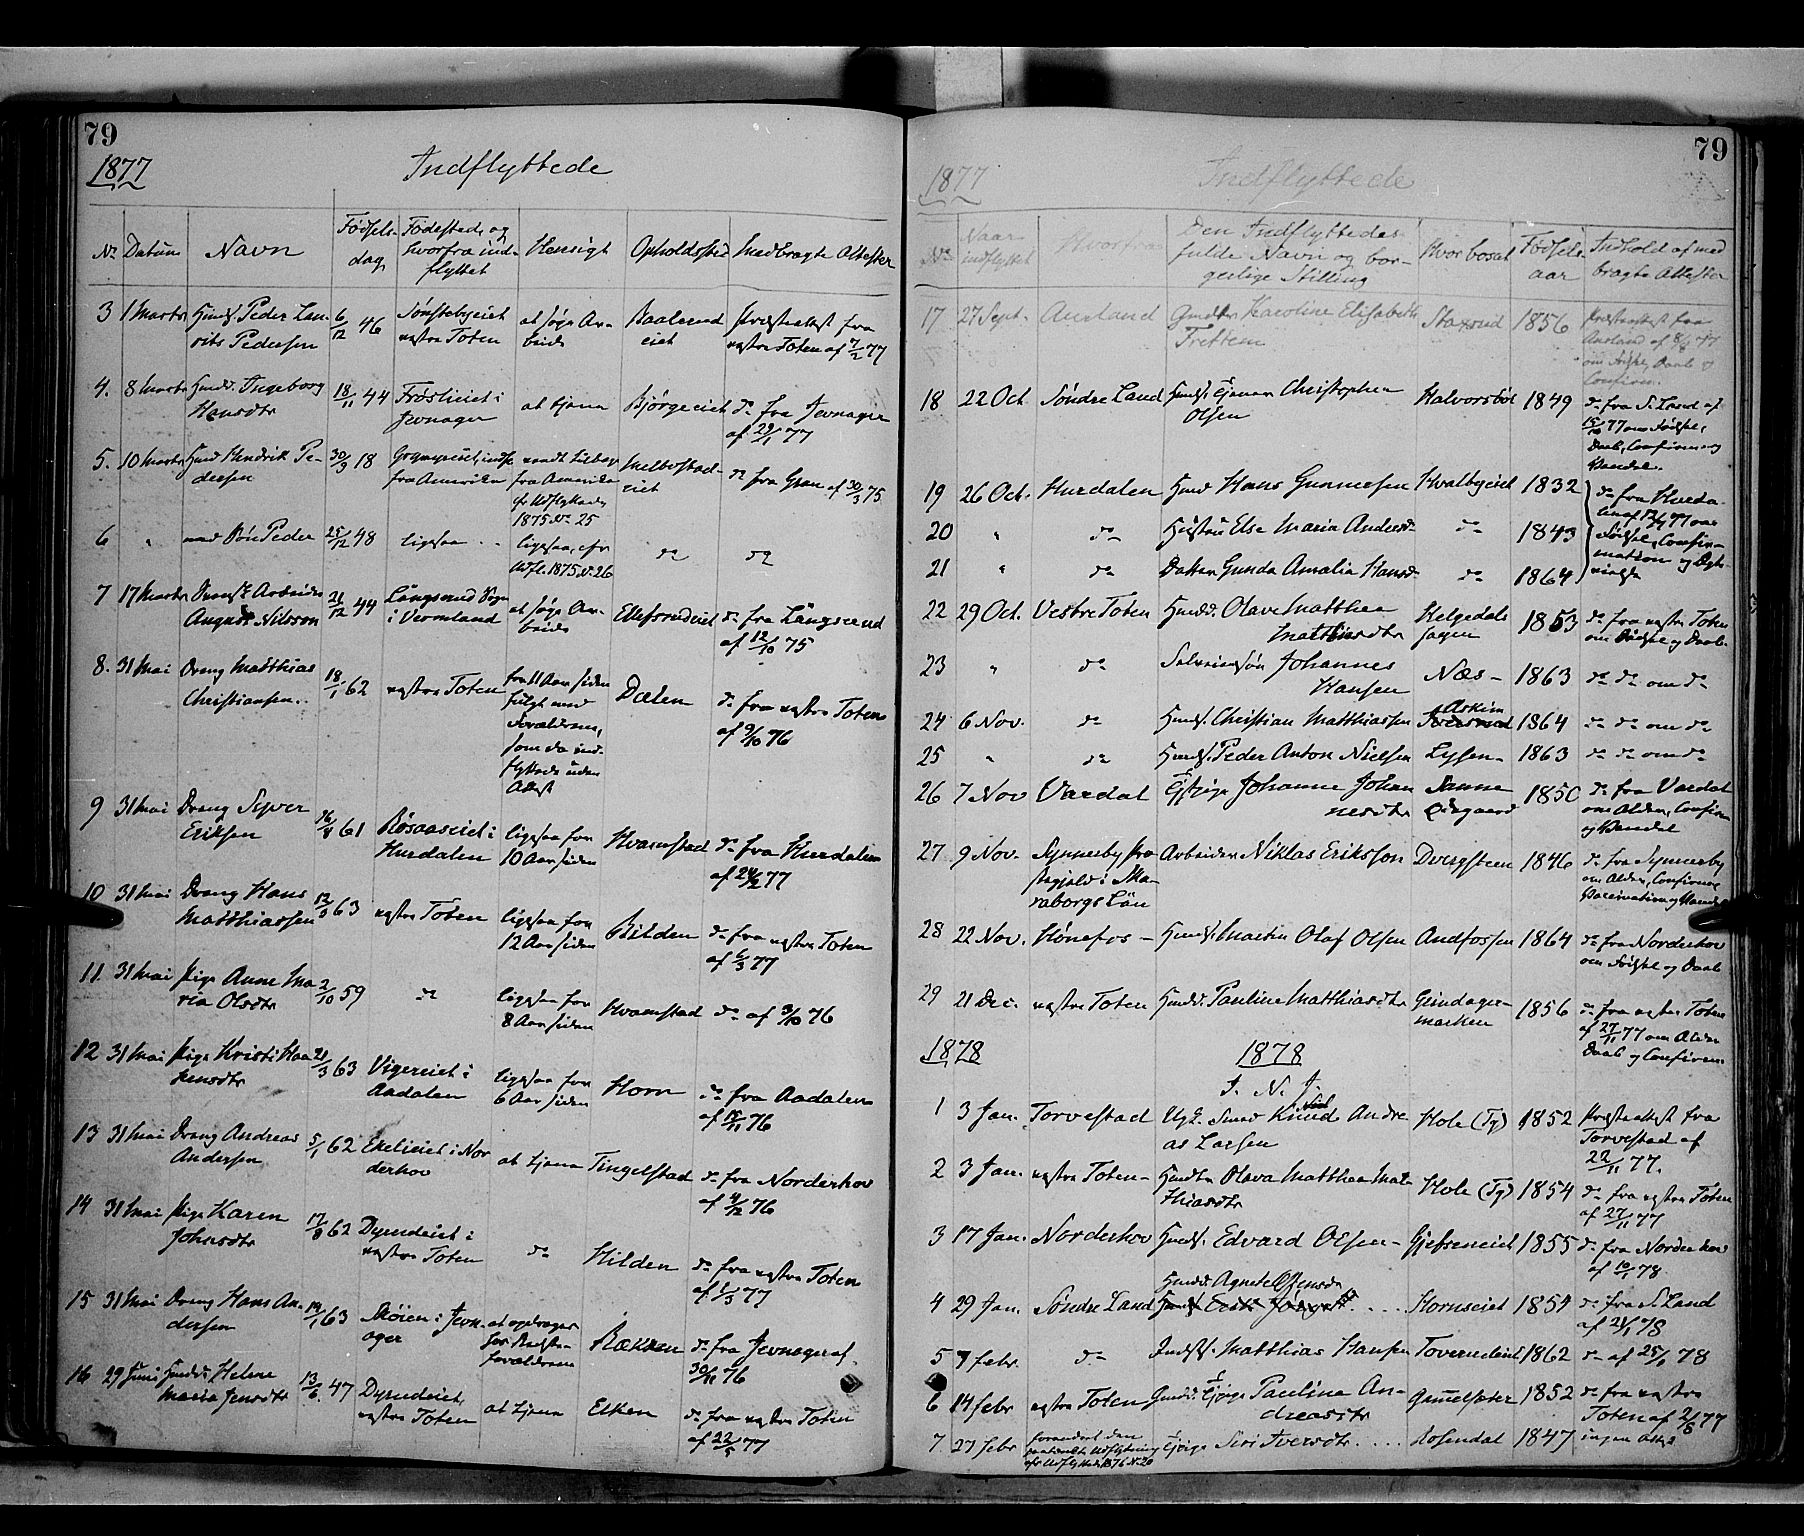 SAH, Gran prestekontor, Ministerialbok nr. 13, 1875-1879, s. 79